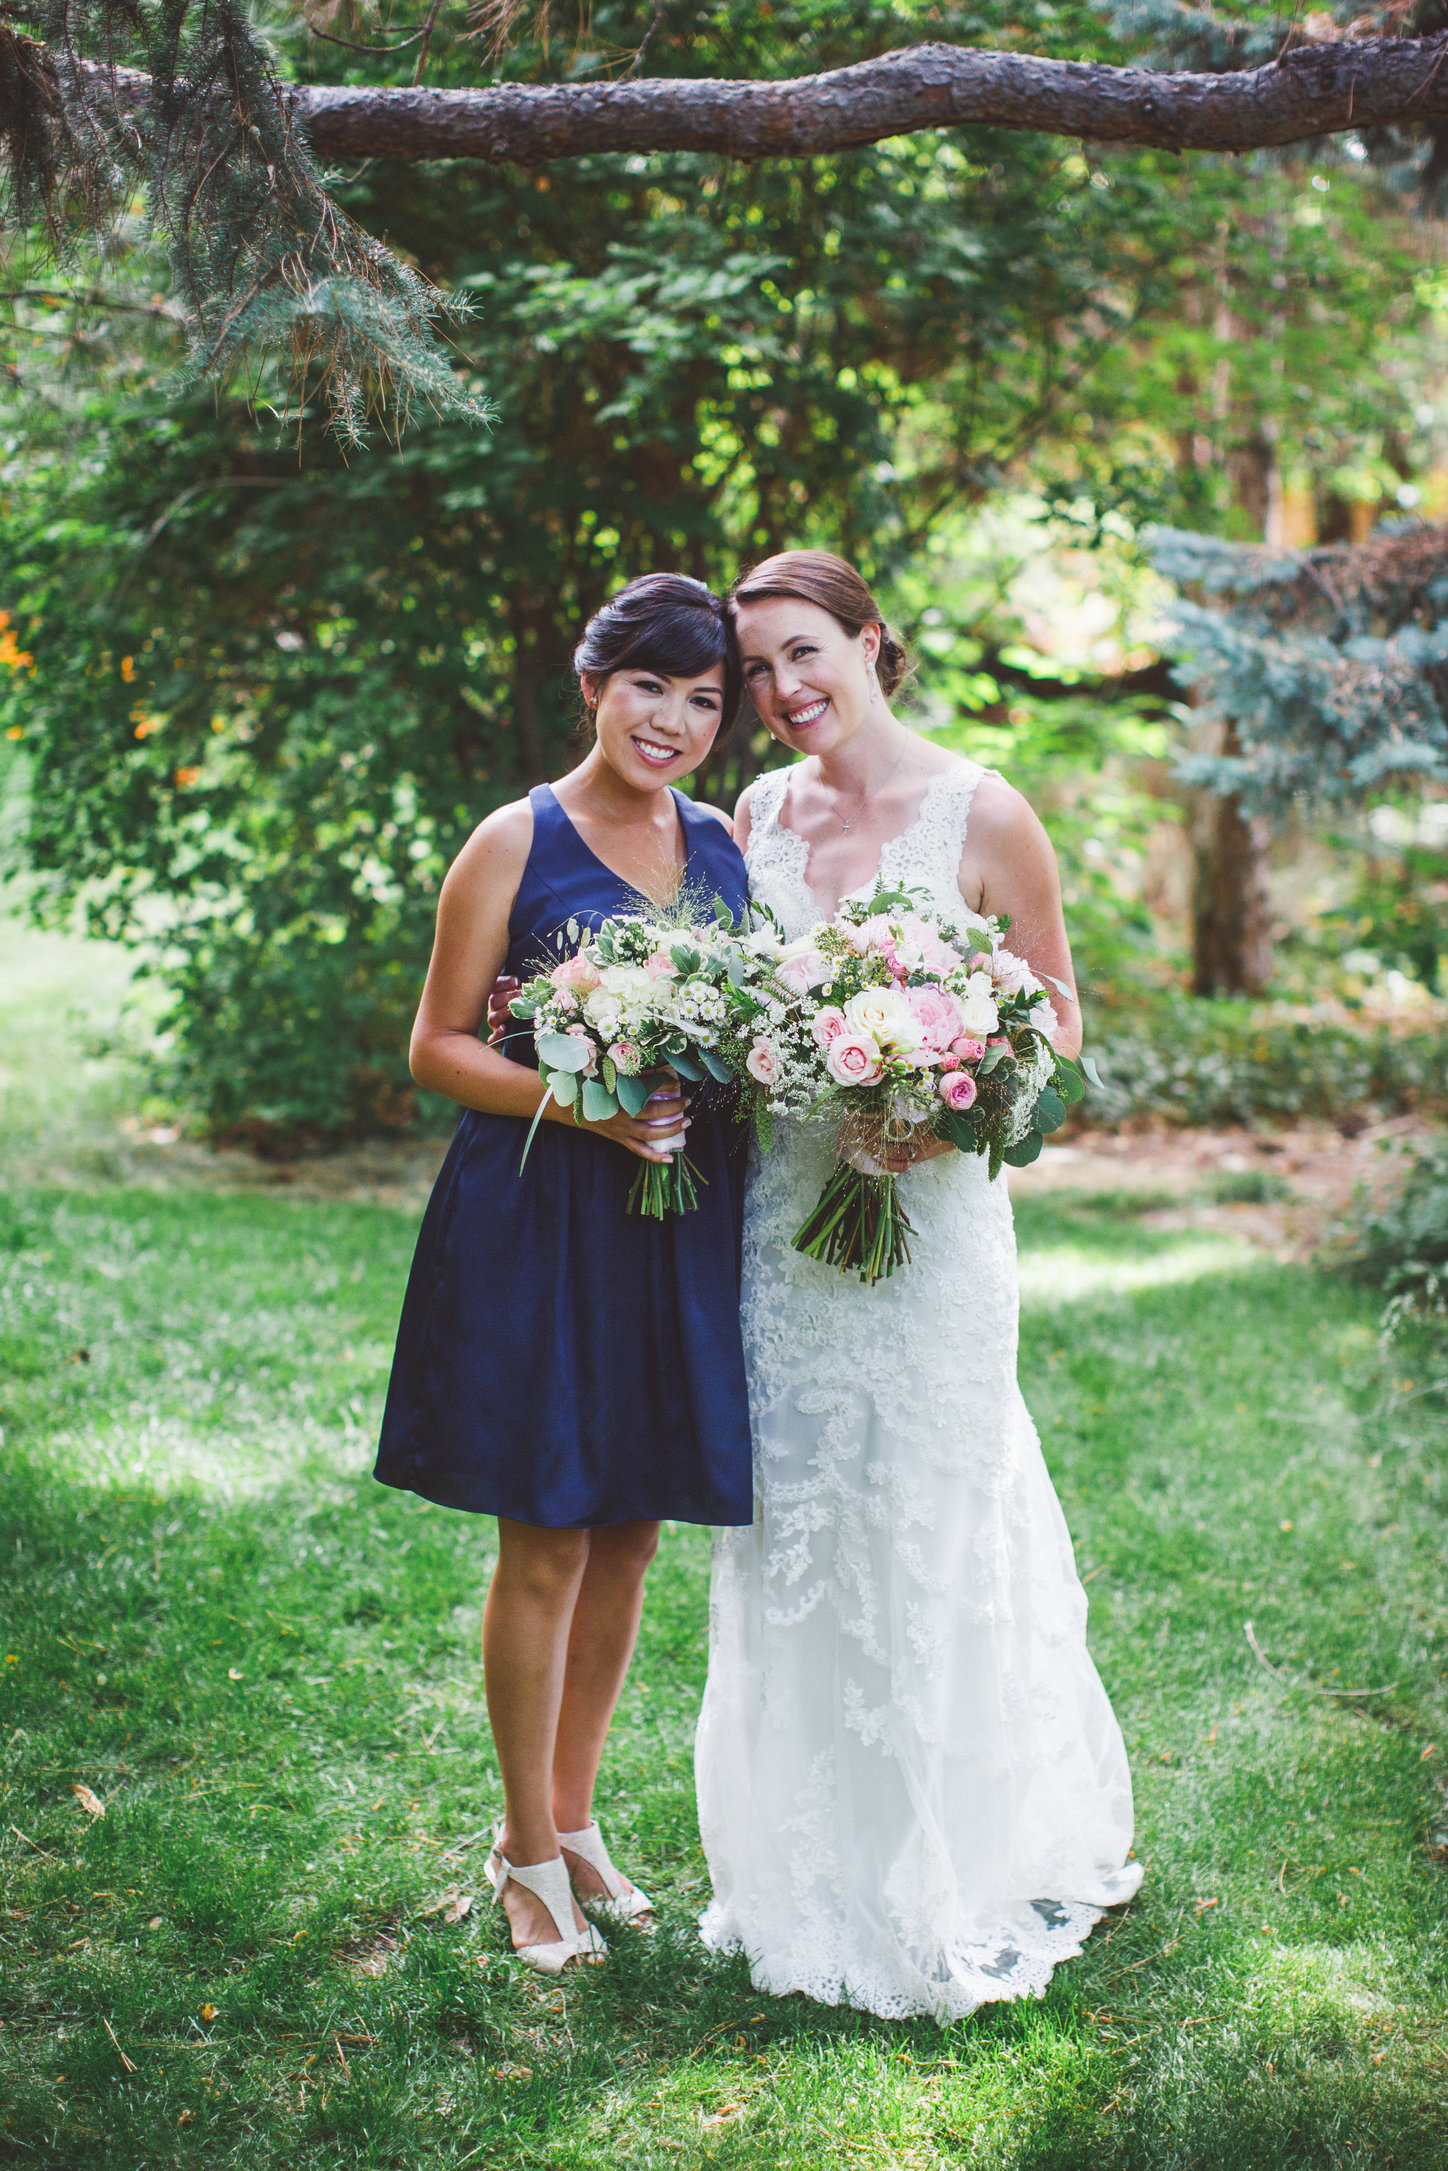 SandC-wedding-364.jpg